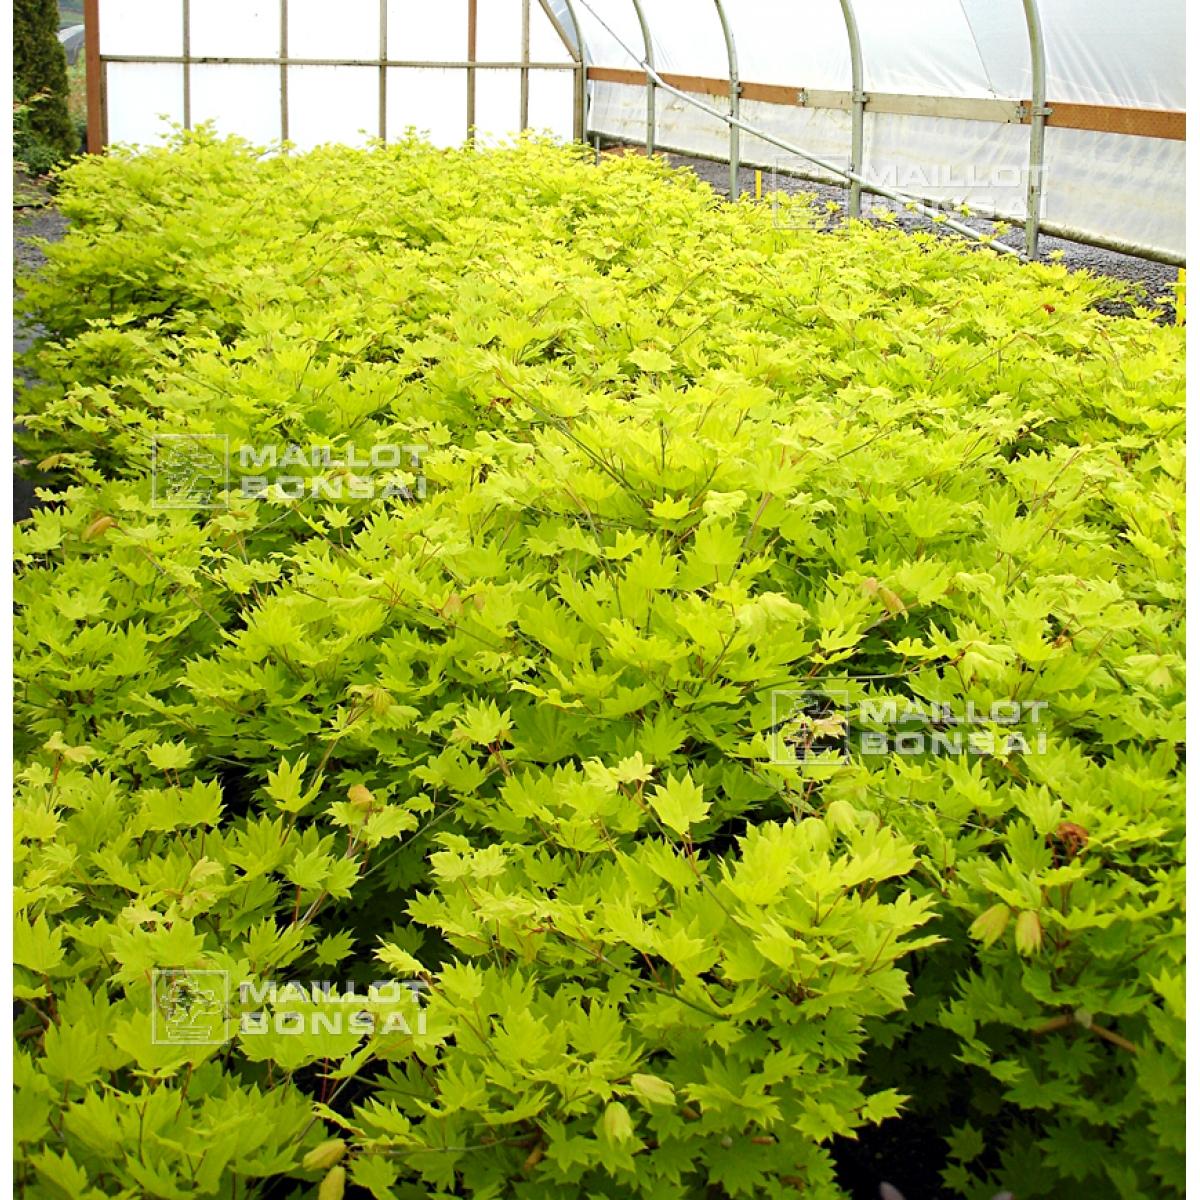 Acer Seeds And More Acer Shirasawanum Aureum Seeds From Maillot